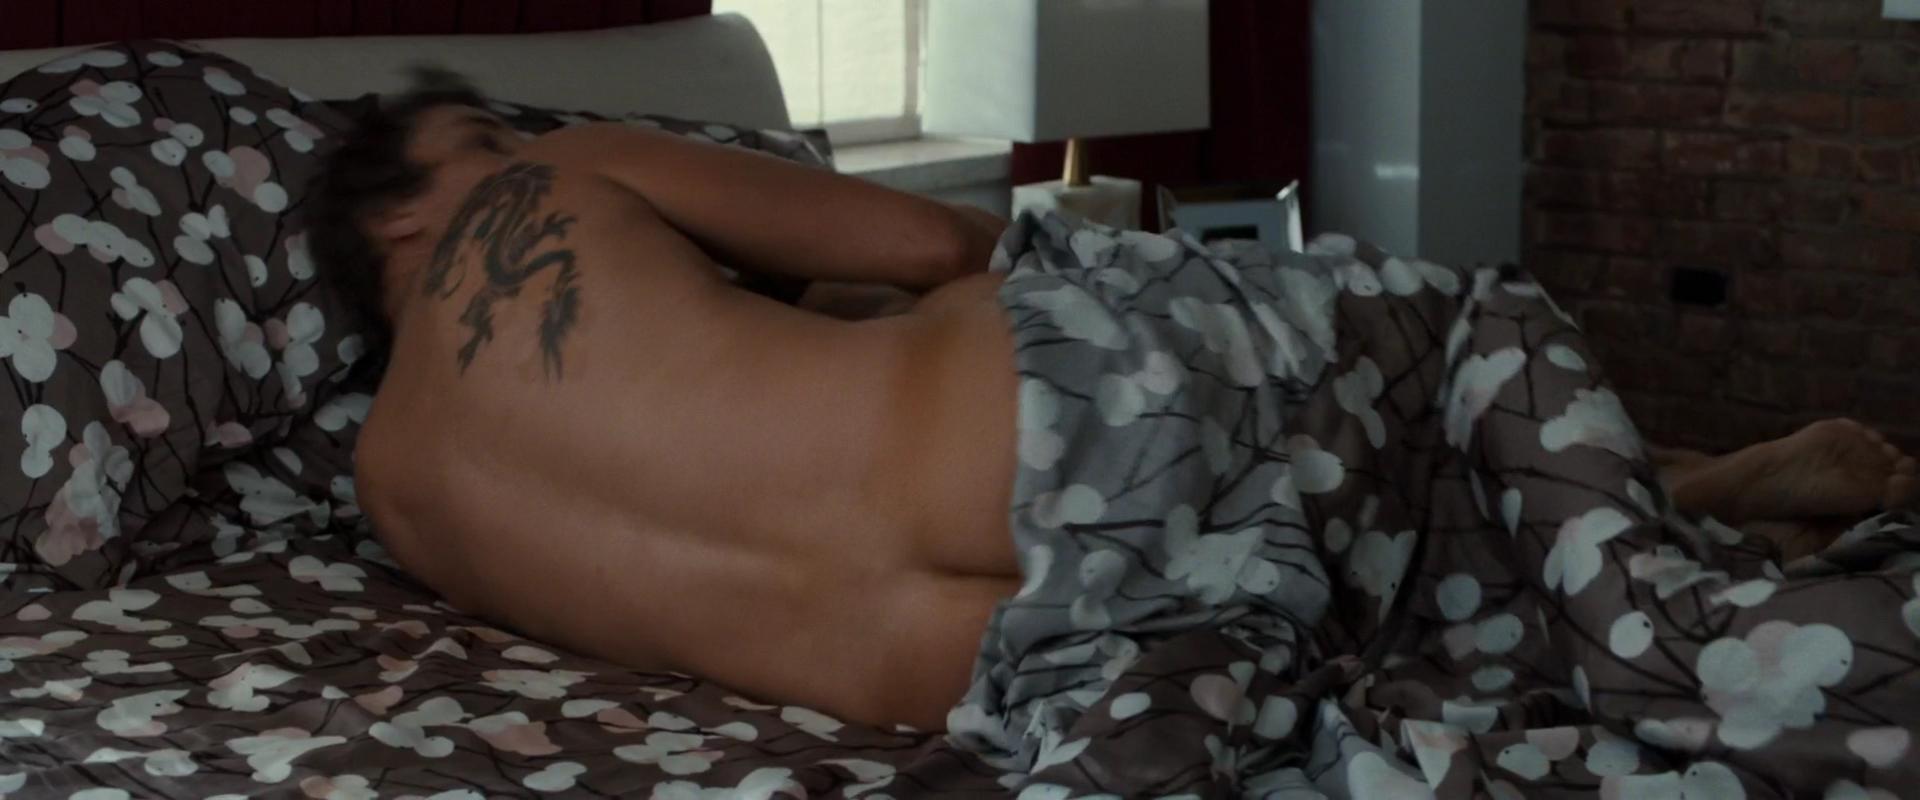 Dax shepard naked photo pity